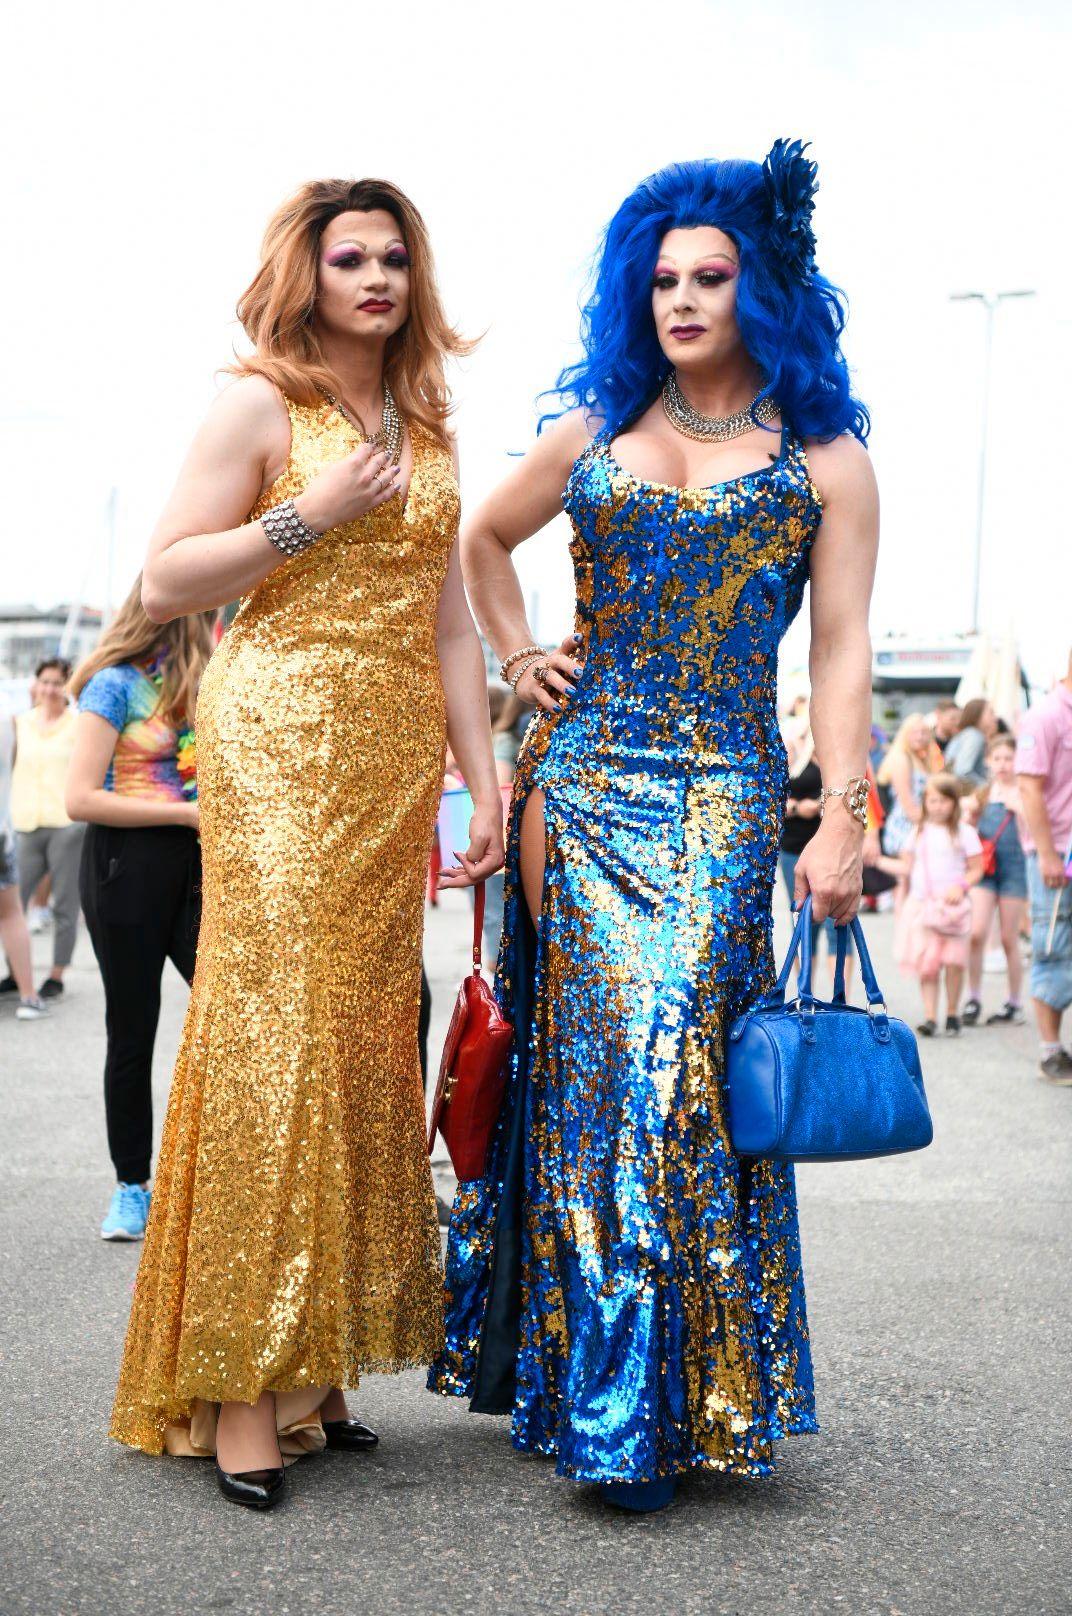 PRIDE-PARADEN: Frida Fis (eller Christian Haugen, som han heter til vanlig) og kompisen Kheztity (Jostein) klare for Pride-paraden i Bergen.